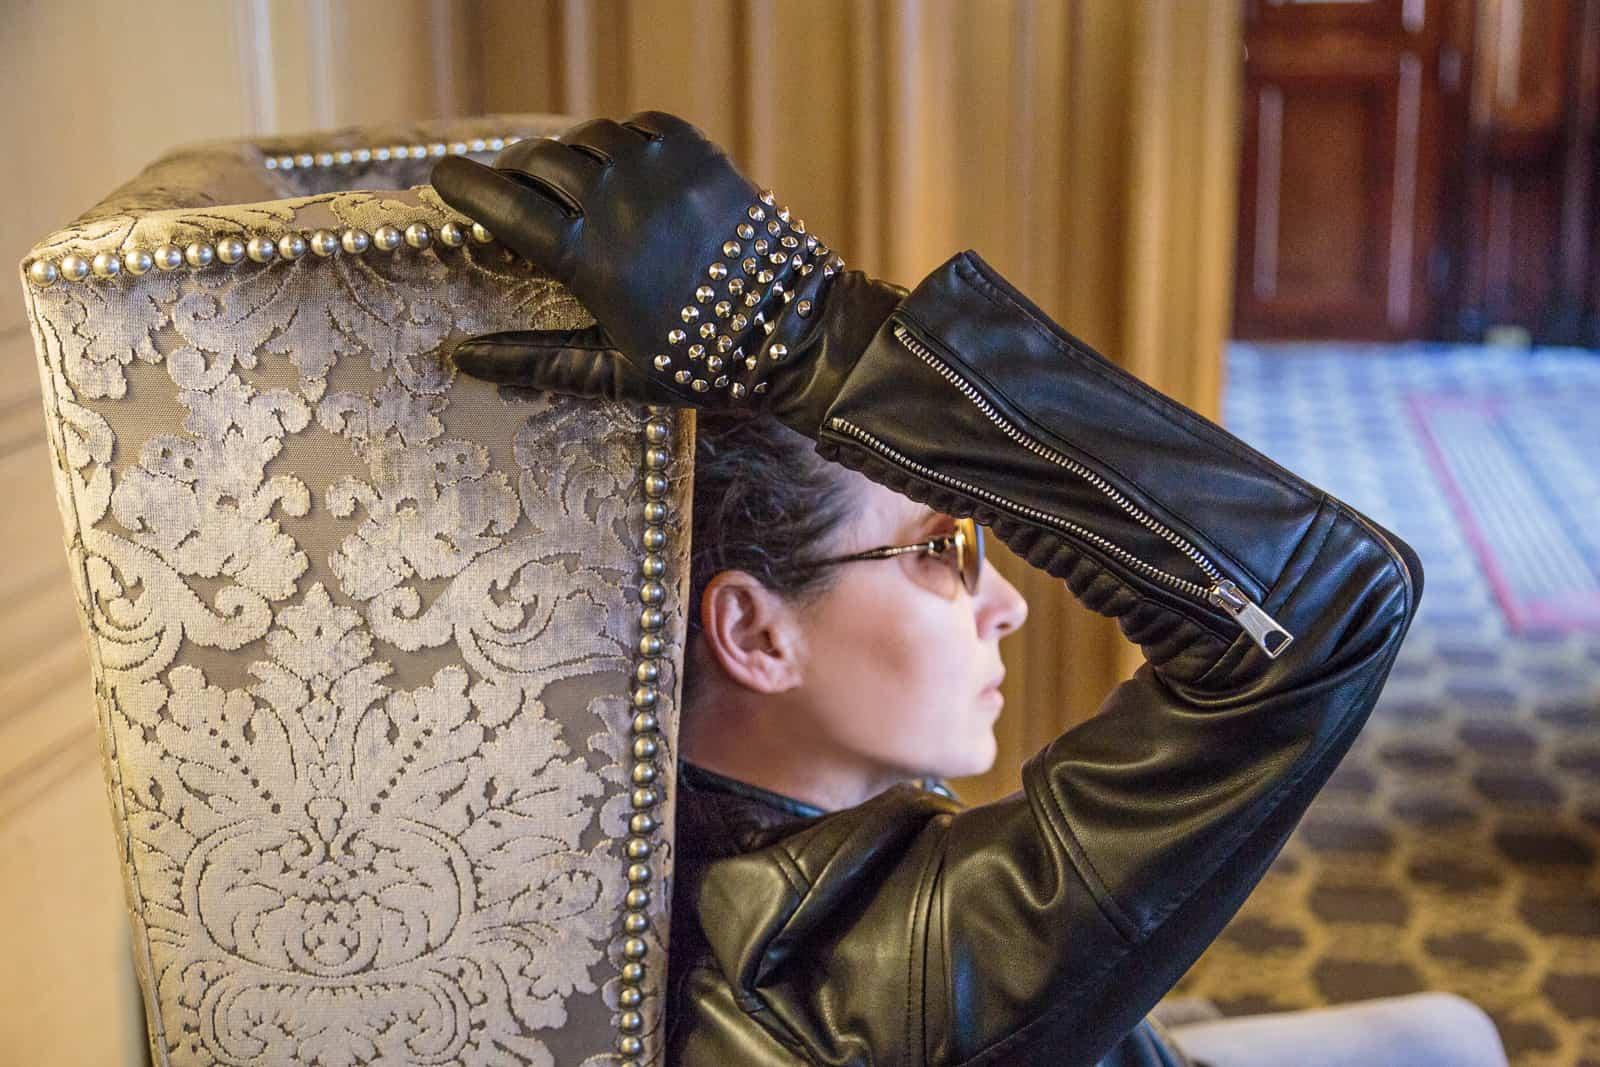 beau-gant-gloves-metal-studs-black-fashion4